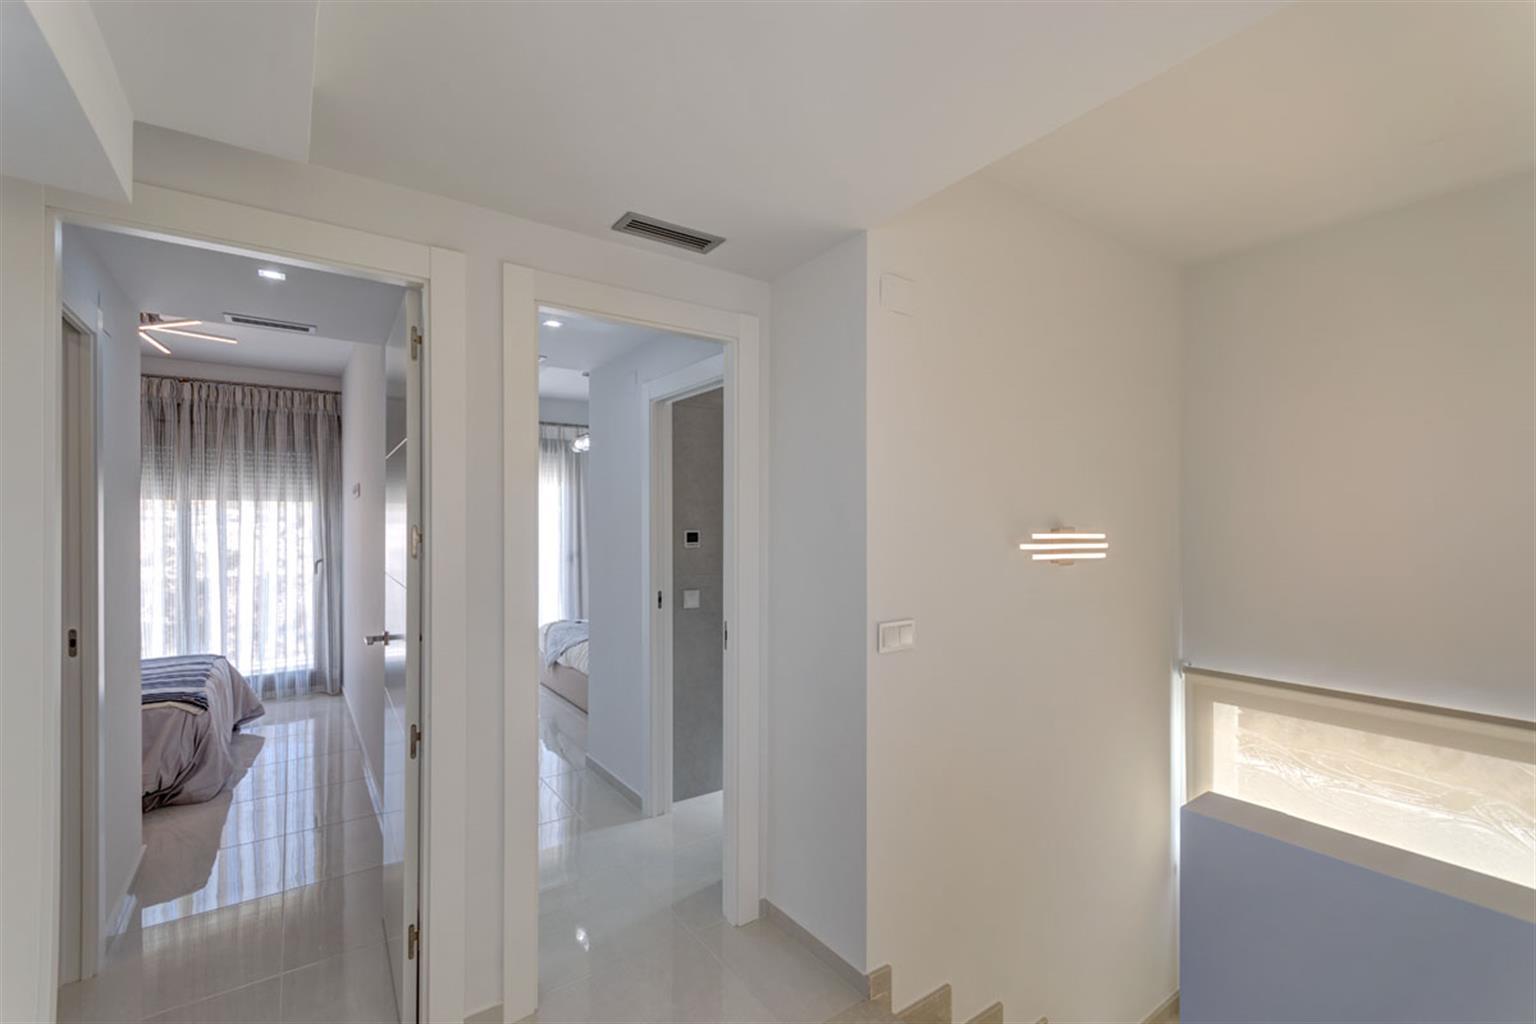 Maison - San Miguel De Salinas - #4227968-7